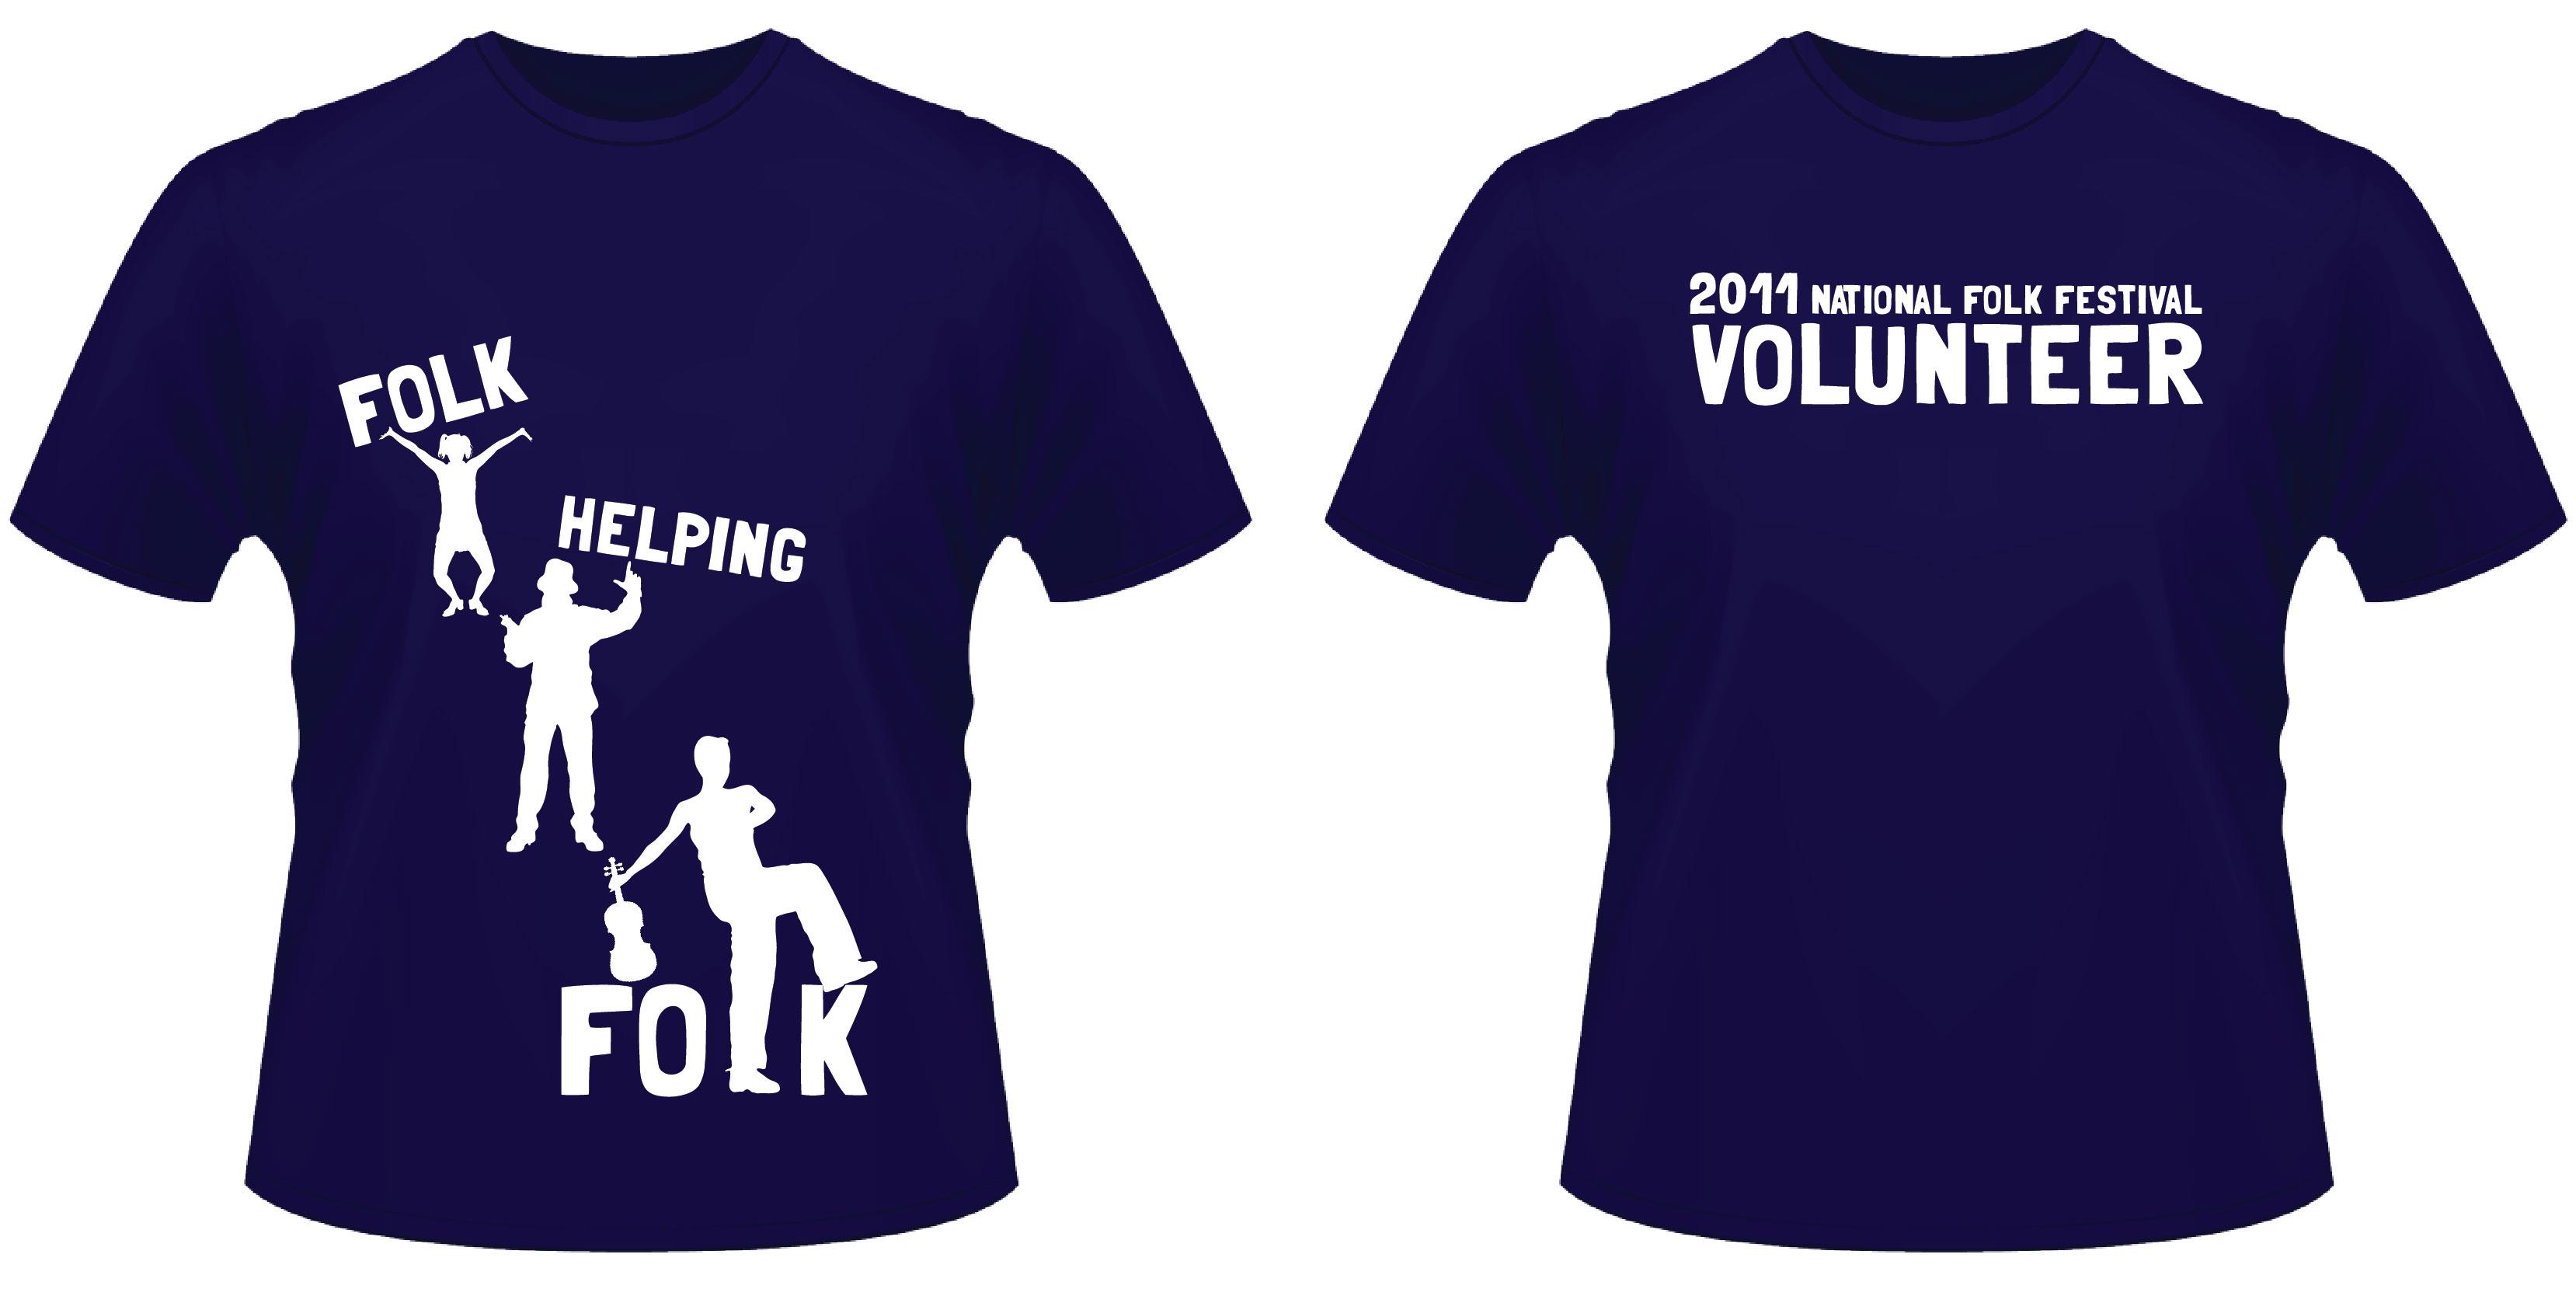 creative t shirt design ideas national folk festival volunteer t shirt 2011 jess creative t shirt design ideas - Ideas For T Shirt Designs